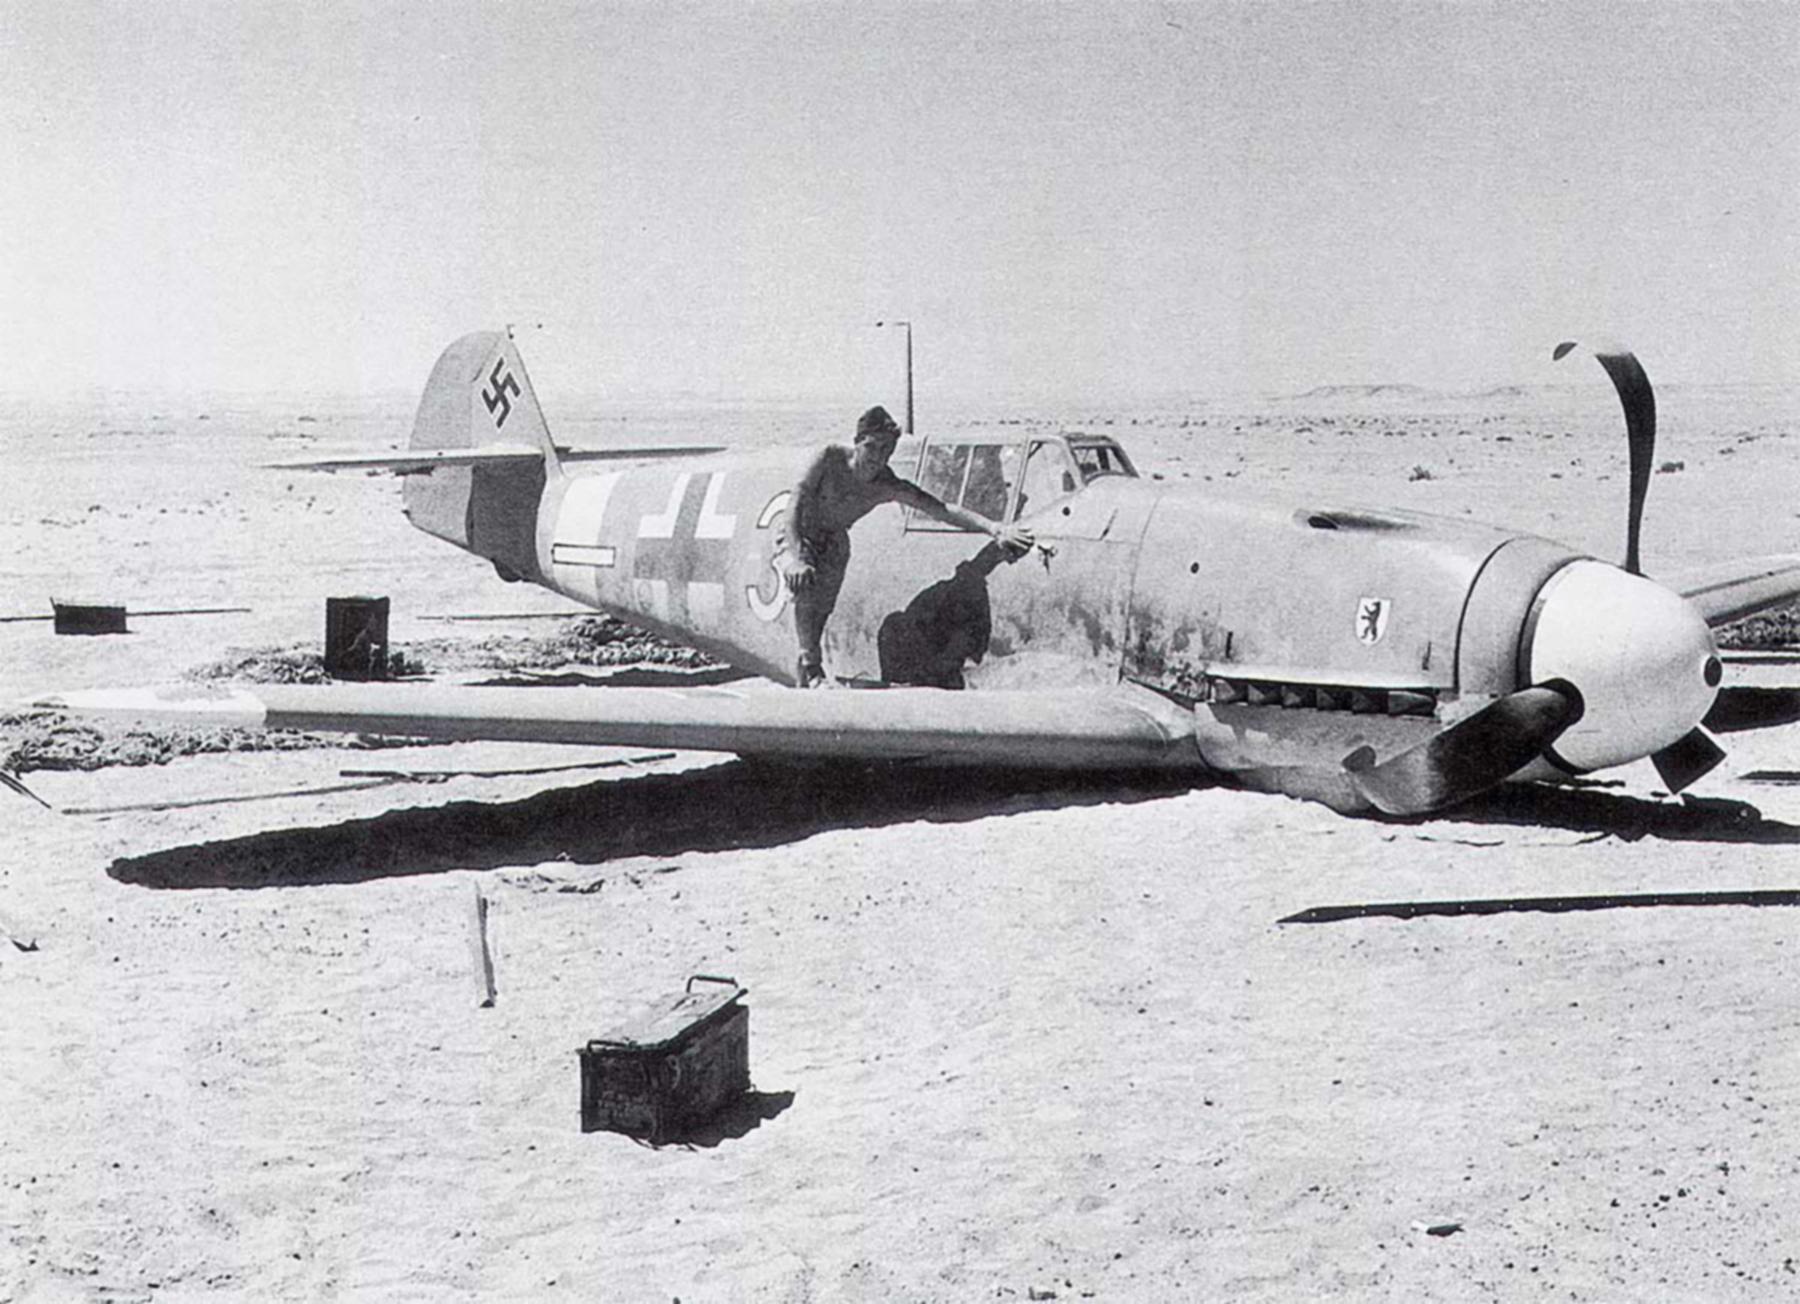 Messerschmitt Bf 109F4Trop 4.JG27 White 3 Alfred Krumlauf WNr 8635 FL 15km SW El Hammam 20th Sep 1942 01